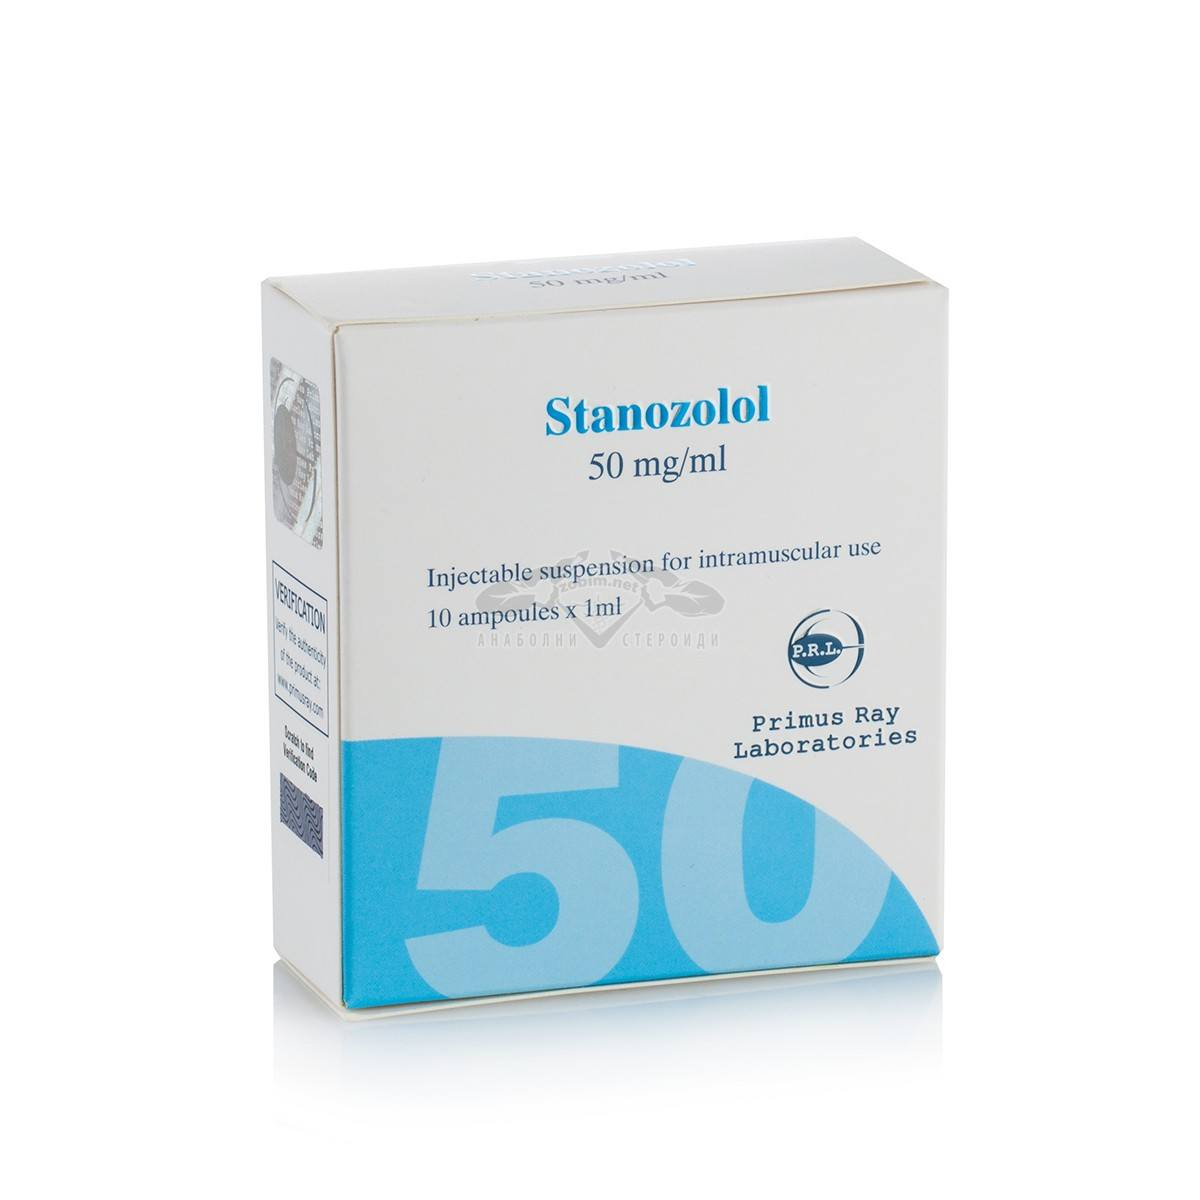 Stanozolol (Винстрол) – 10 амп. х 50 мг.